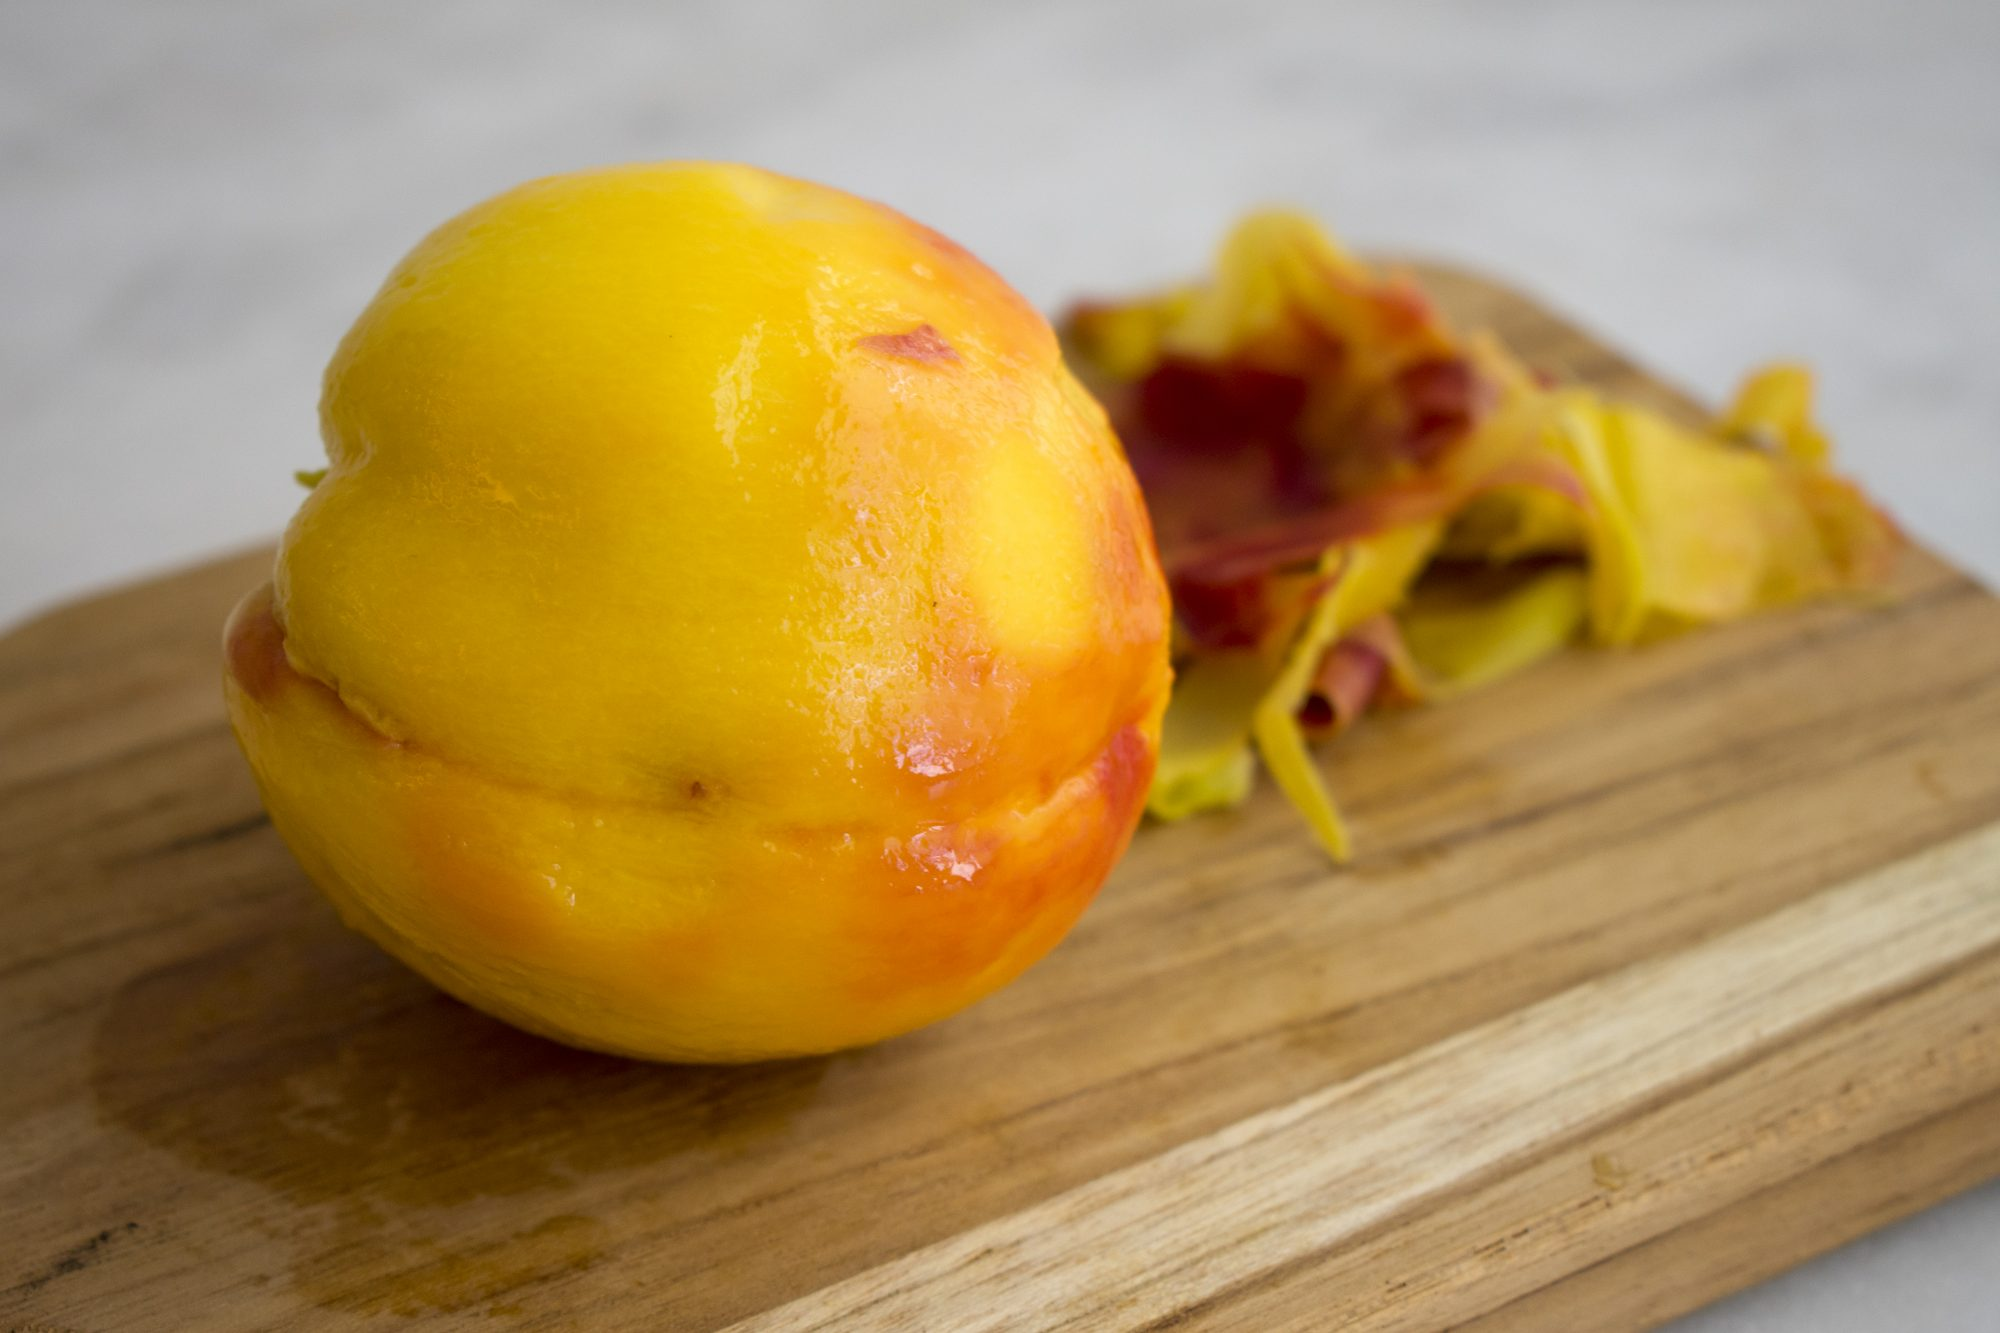 Peeled peach Getty 8/5/20